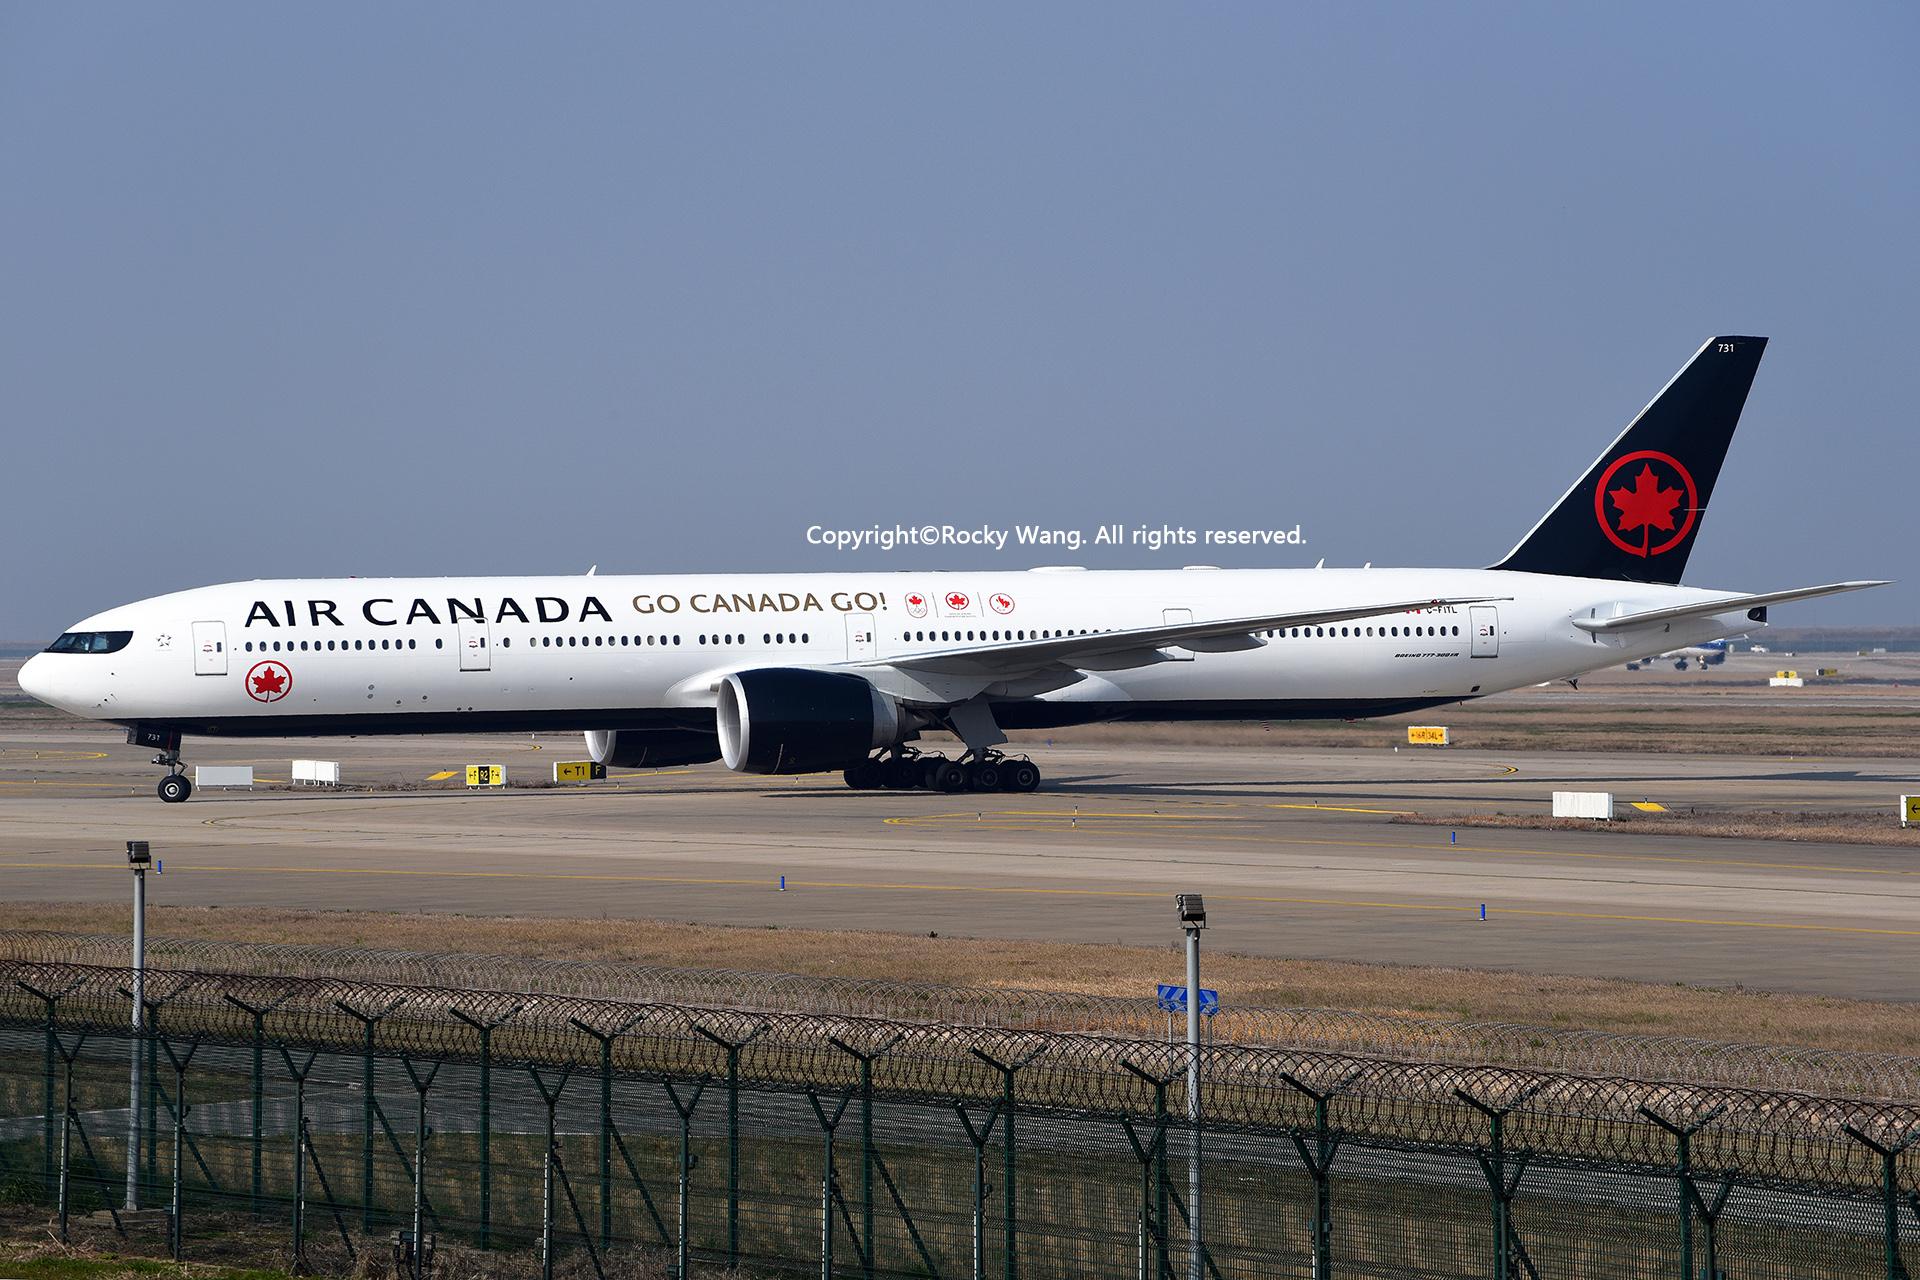 Re:[原创]居家了 批量处理老图 倾情奉献52家777 BOEING 777-333ER C-FITL Shanghai Pudong